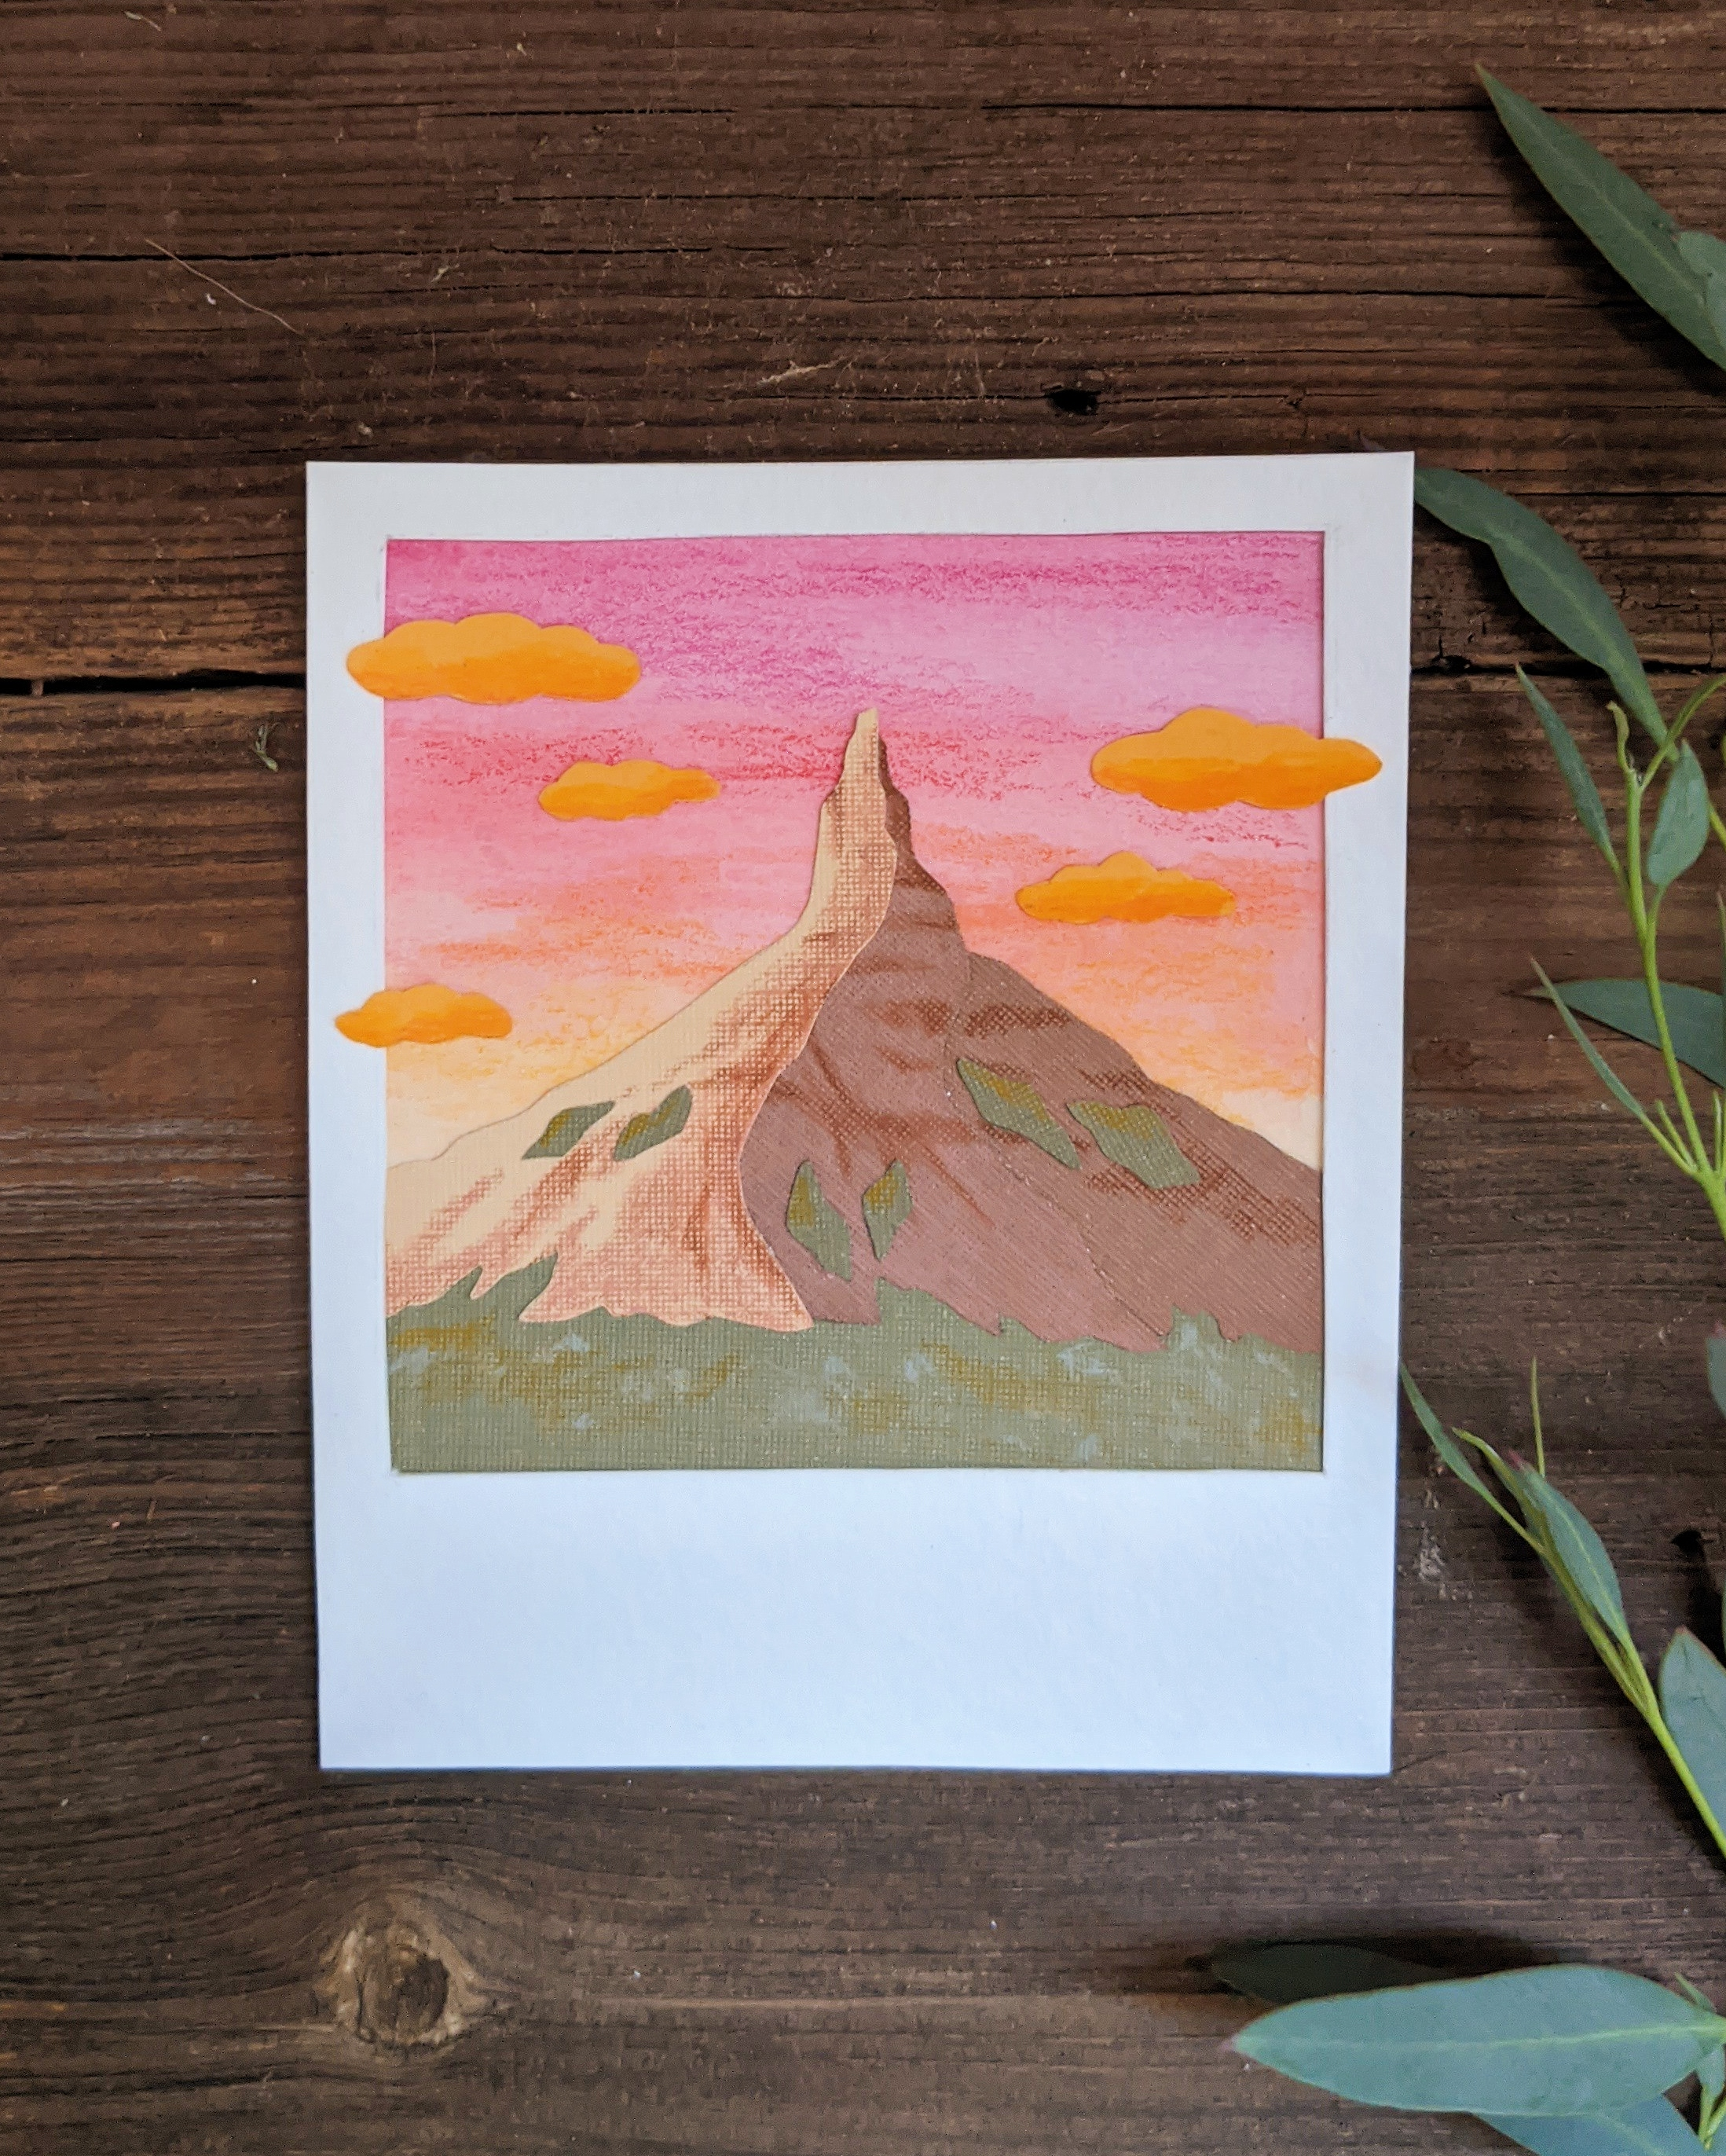 Drawn polaroid of Chimney Rock